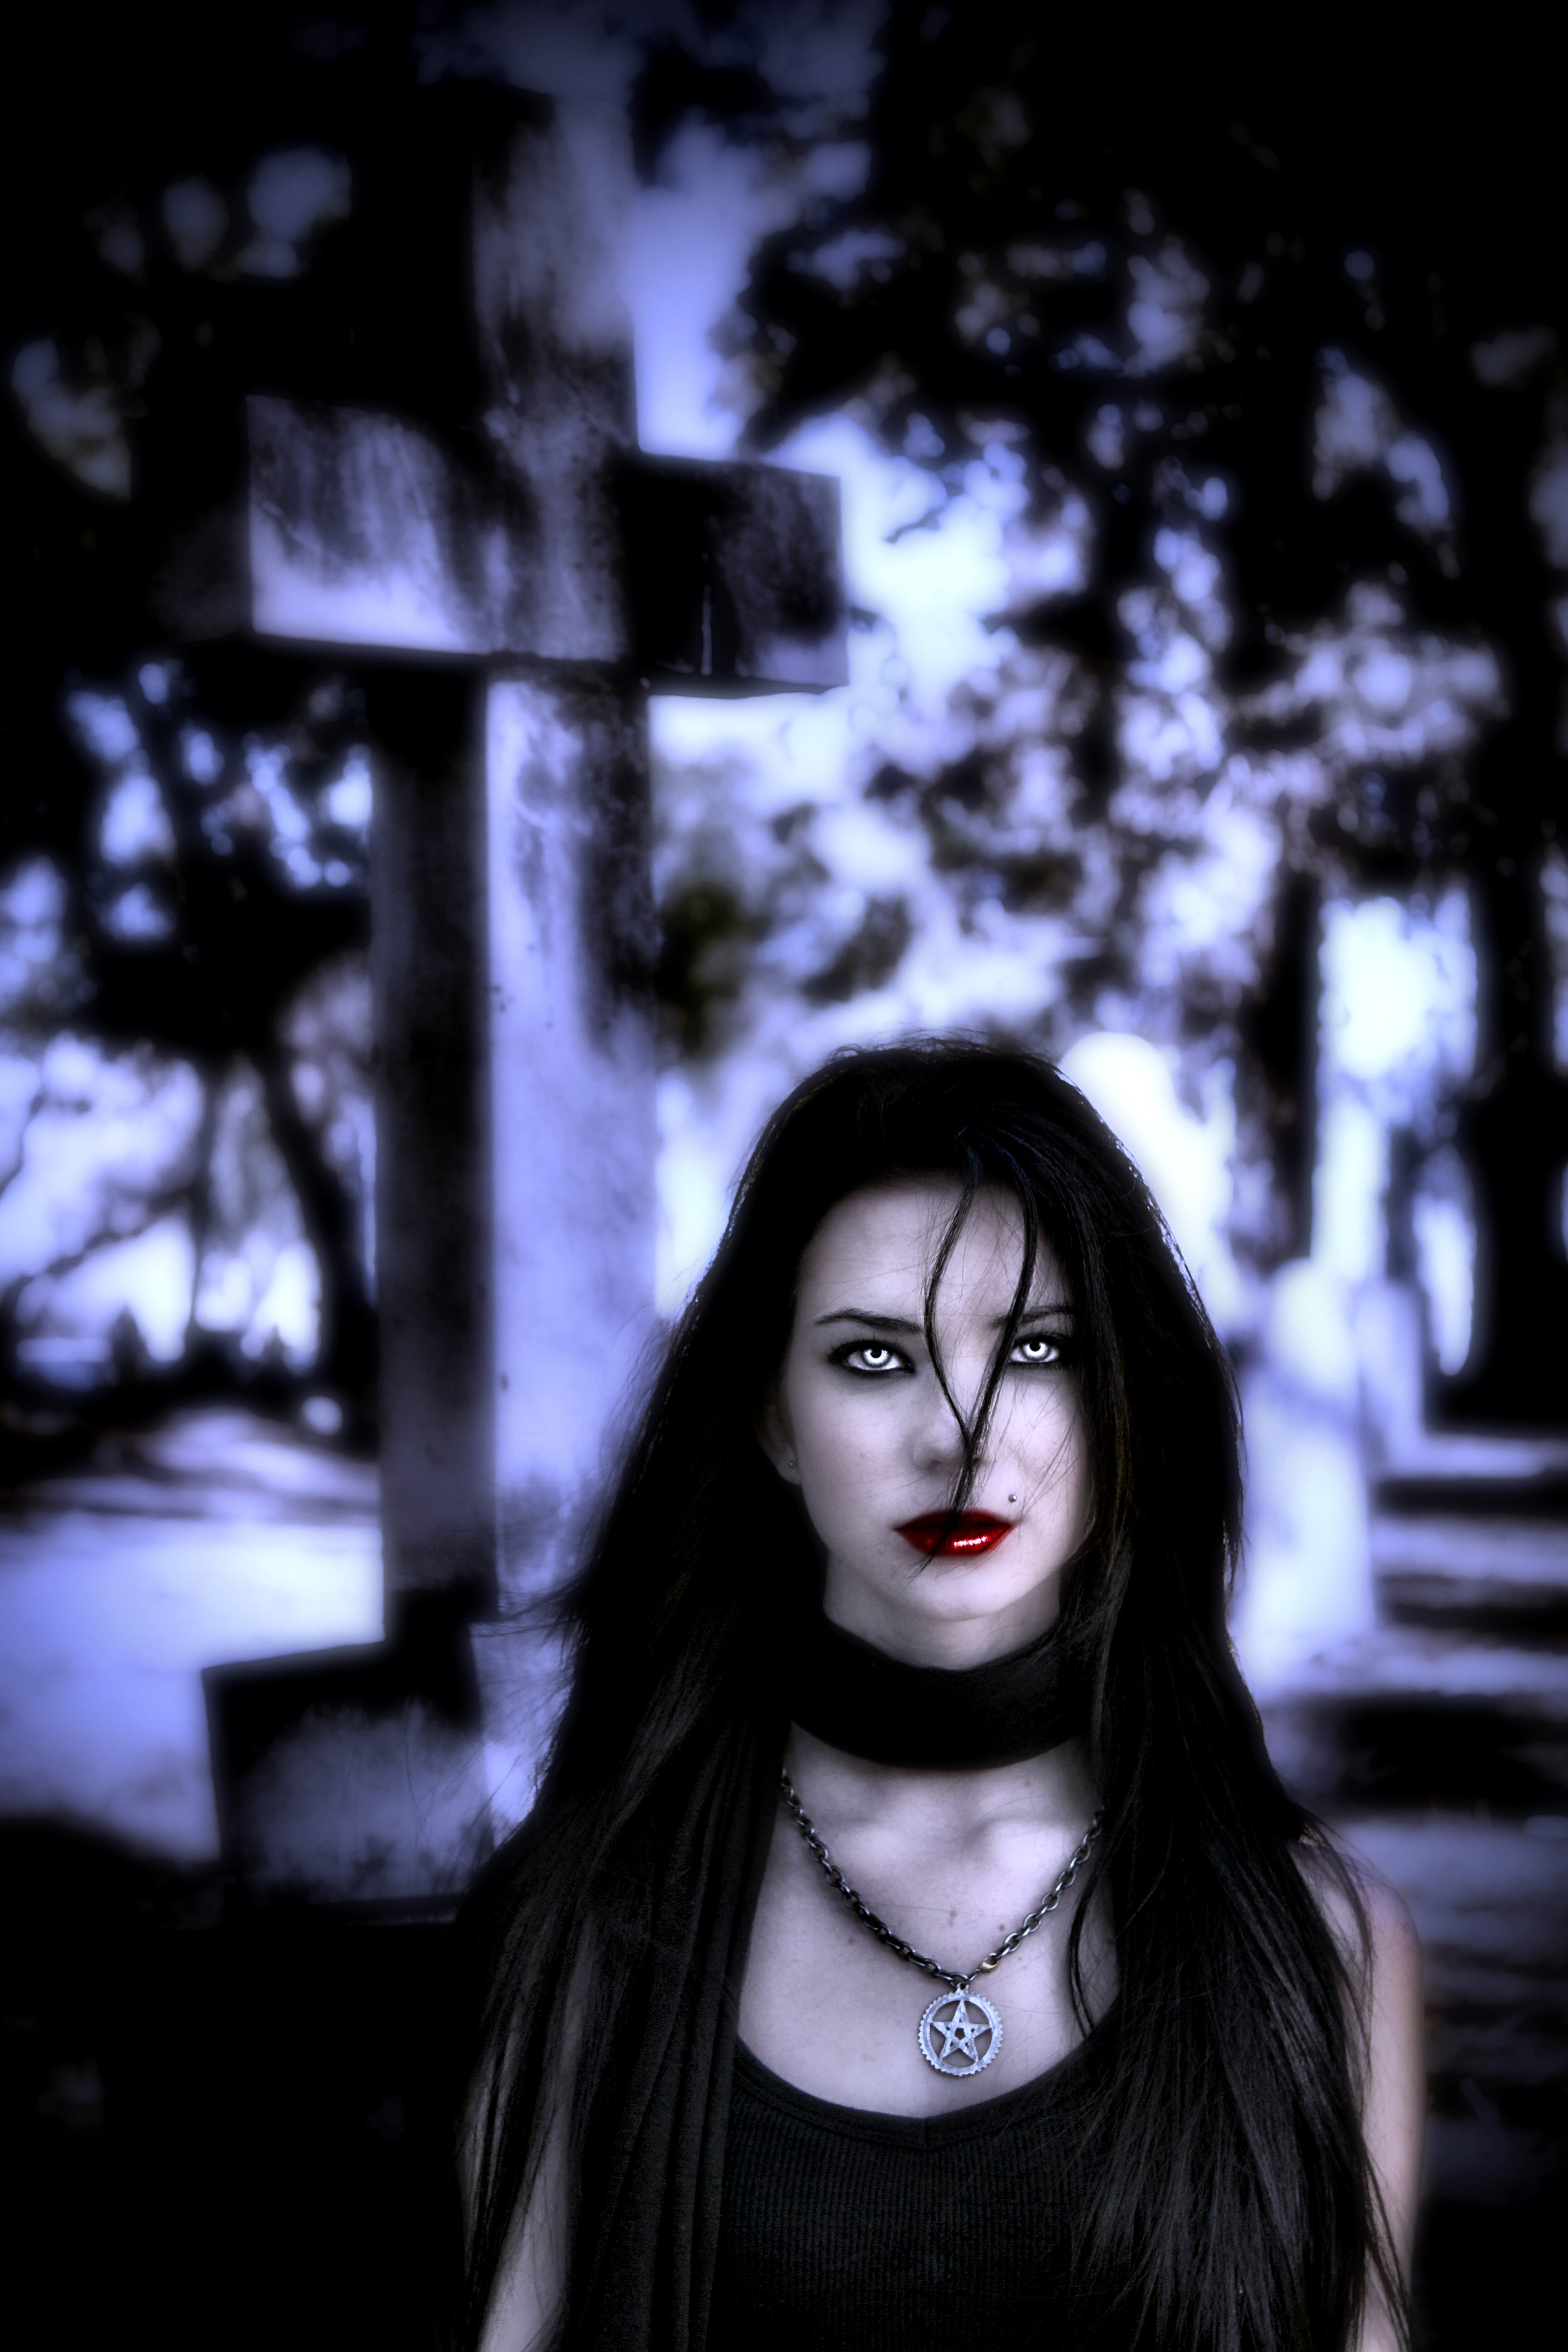 Vampire Melissa Deady Graveyard By Darkest B4 Dawn